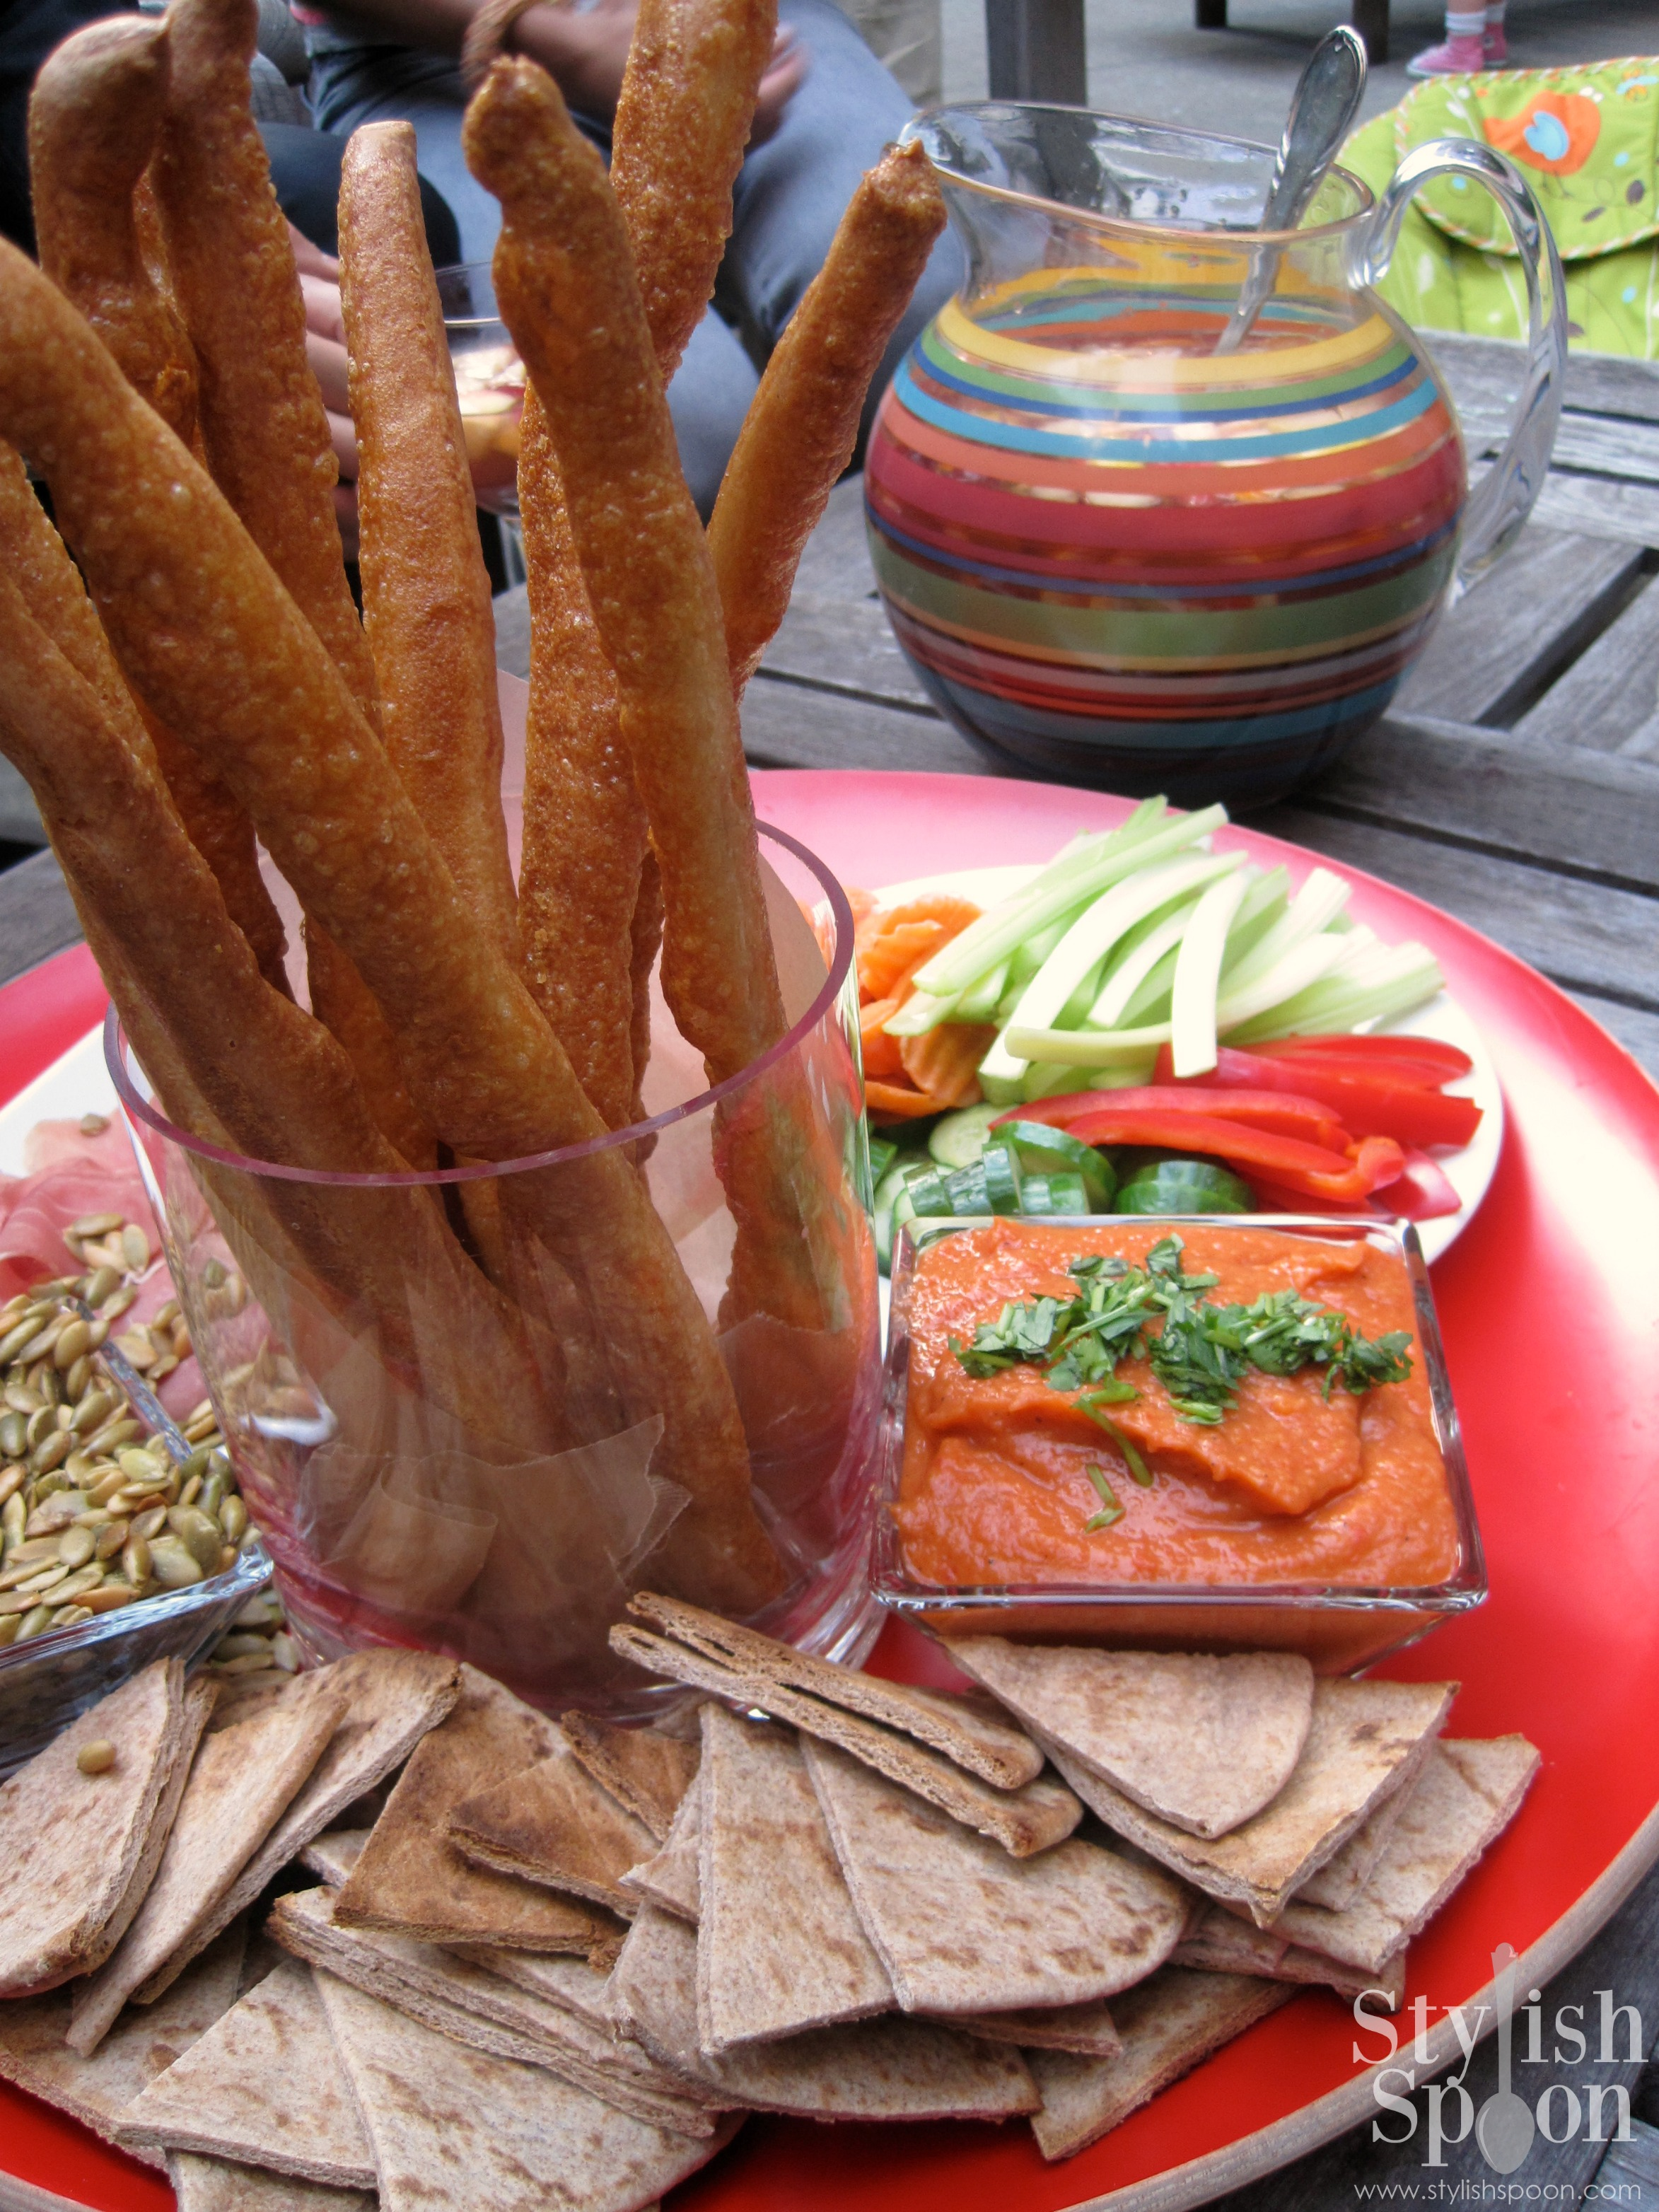 Risotteria Gluten-Free Breadsticks